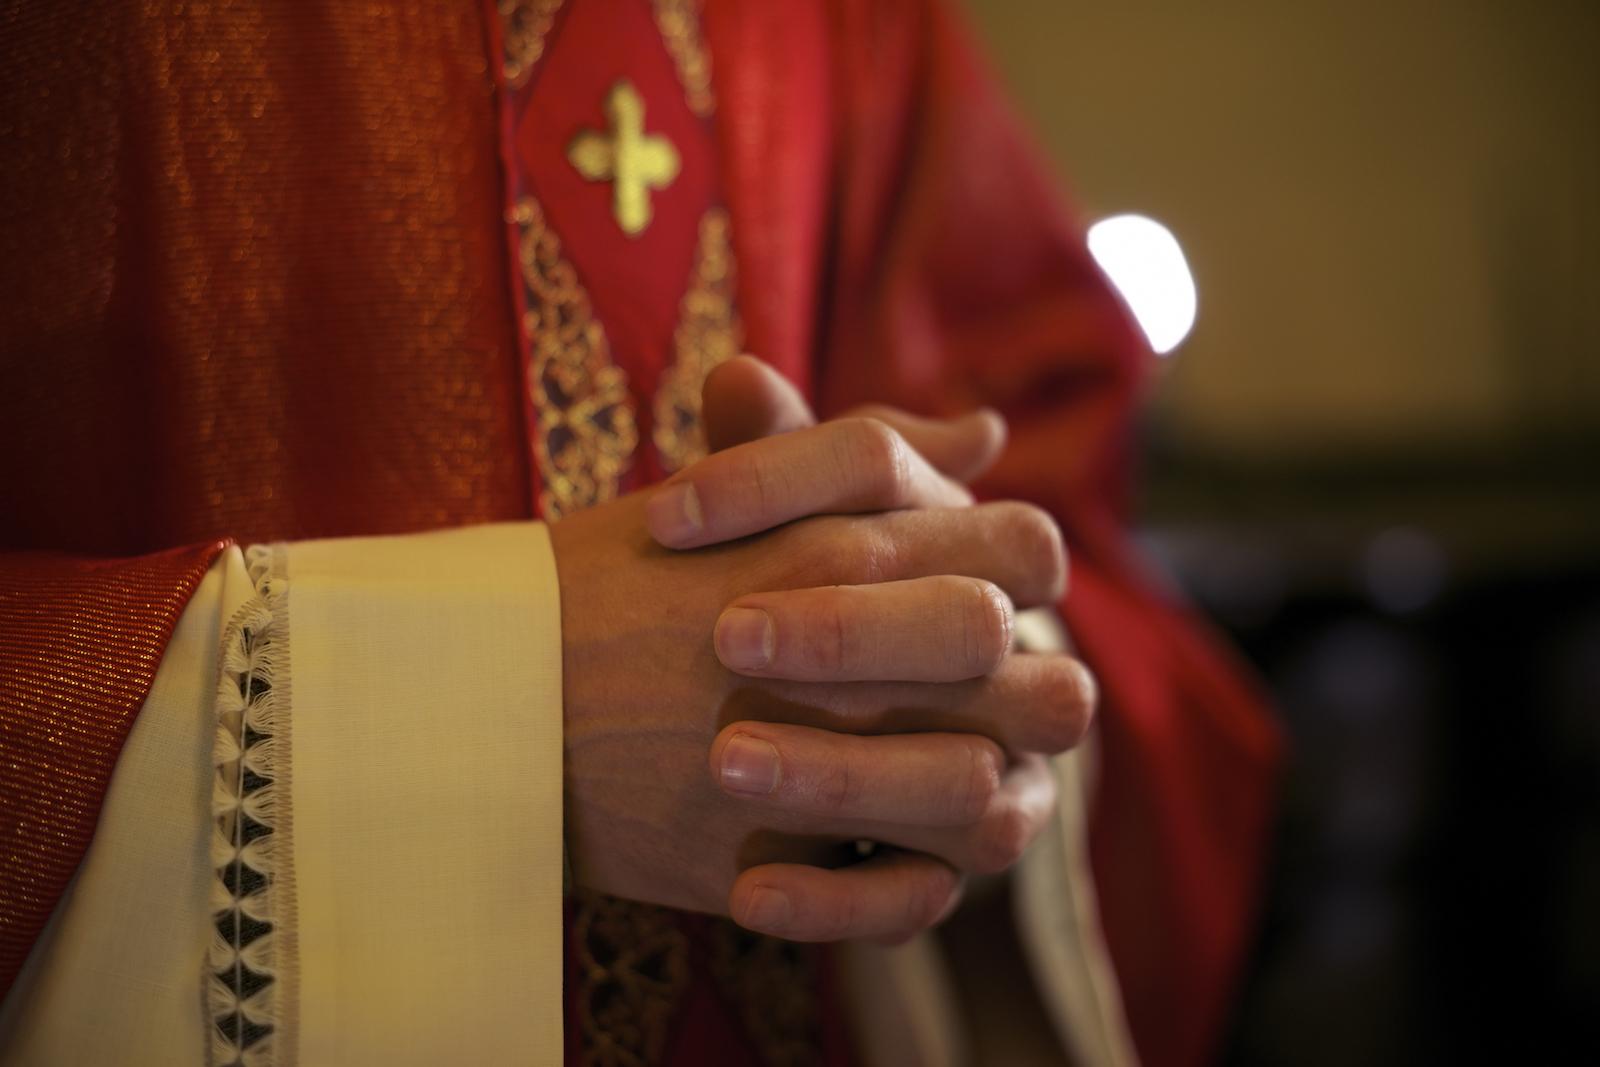 Our local Catholic nightmare | Daniel Markind | The Blogs